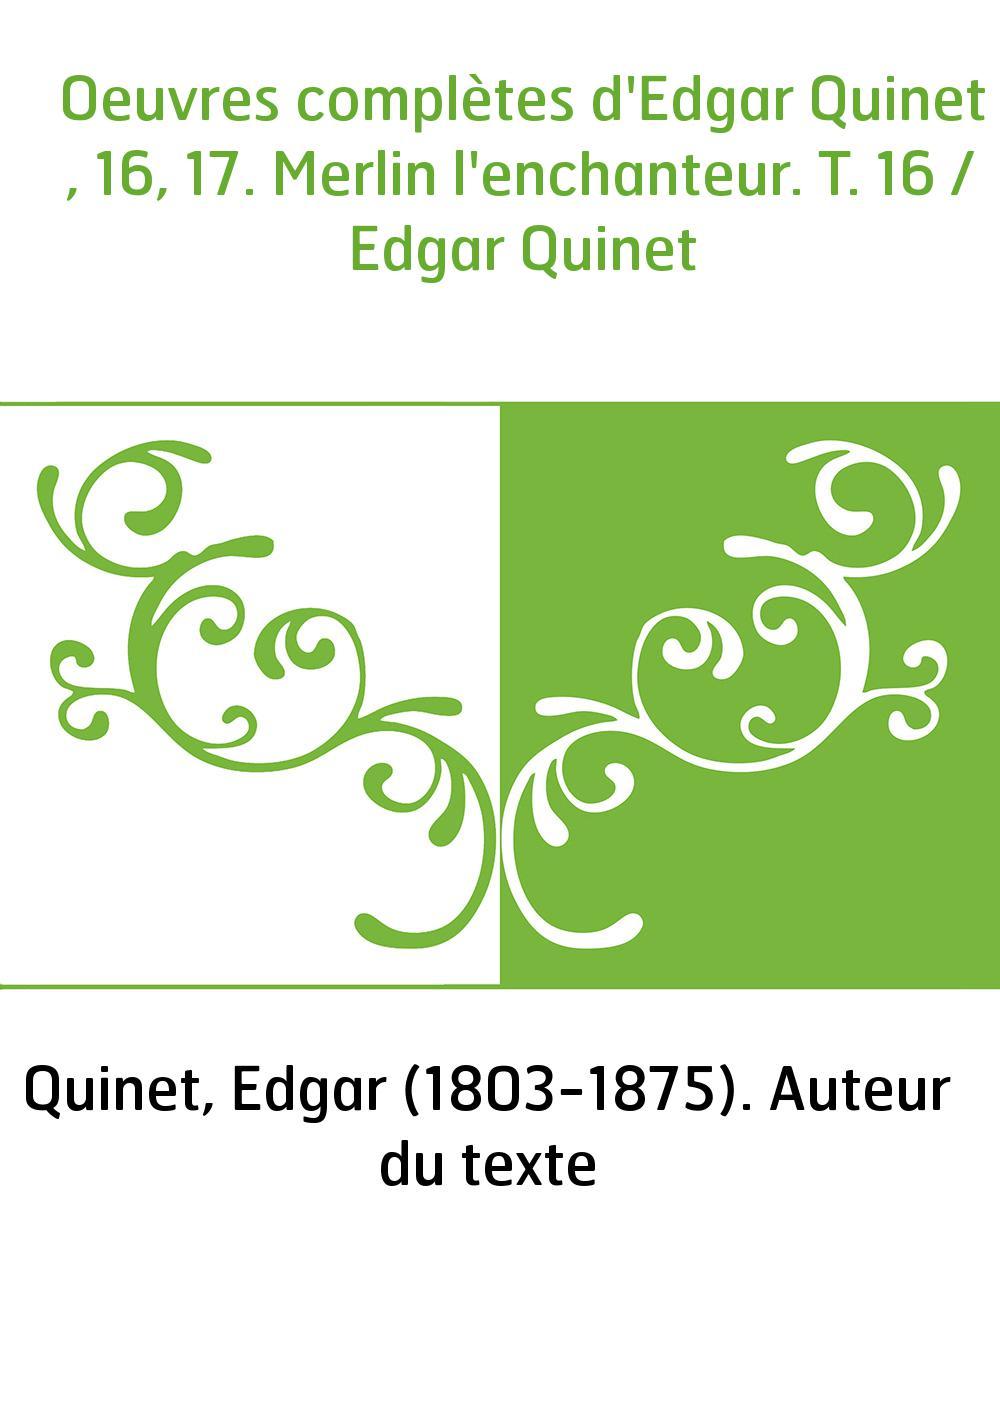 Oeuvres complètes d'Edgar Quinet , 16, 17. Merlin l'enchanteur. T. 16 / Edgar Quinet